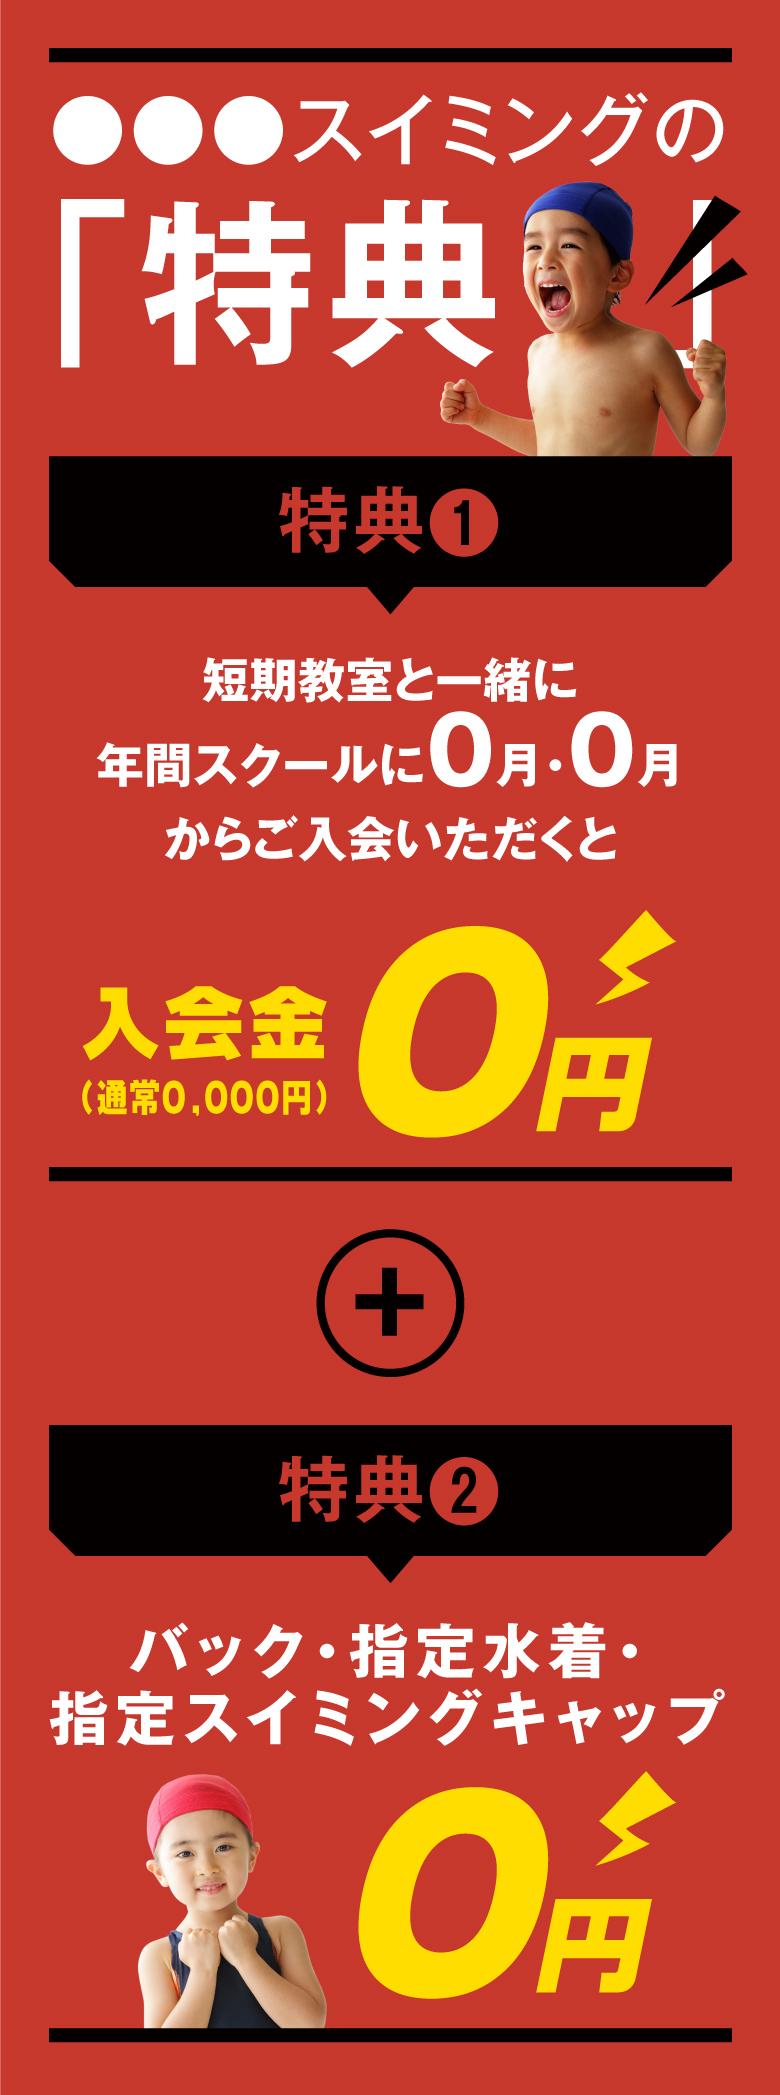 cv-case-ch-20h_a-02-2